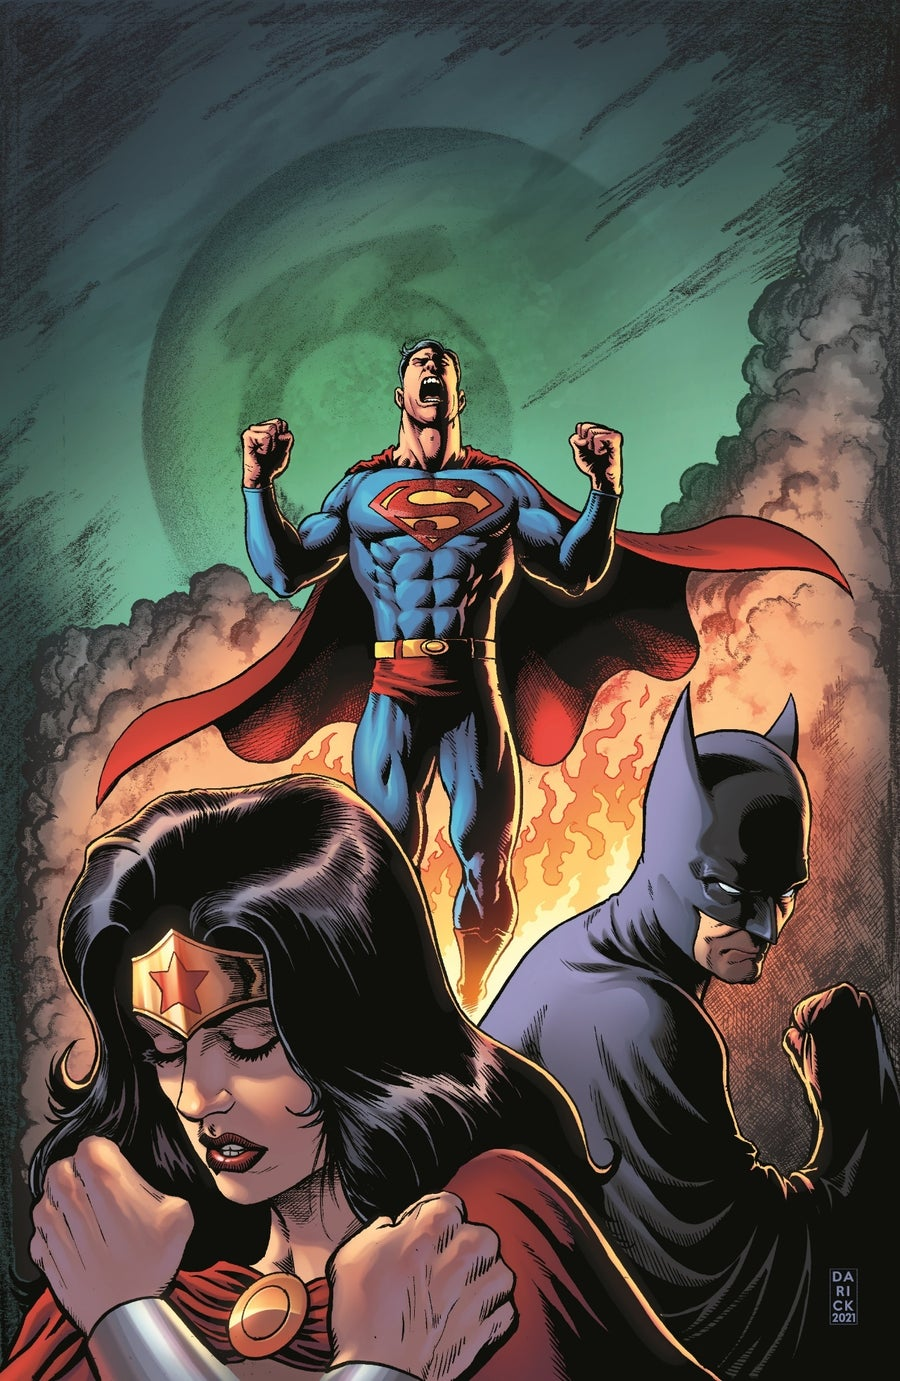 dc comics justice league last ride 1